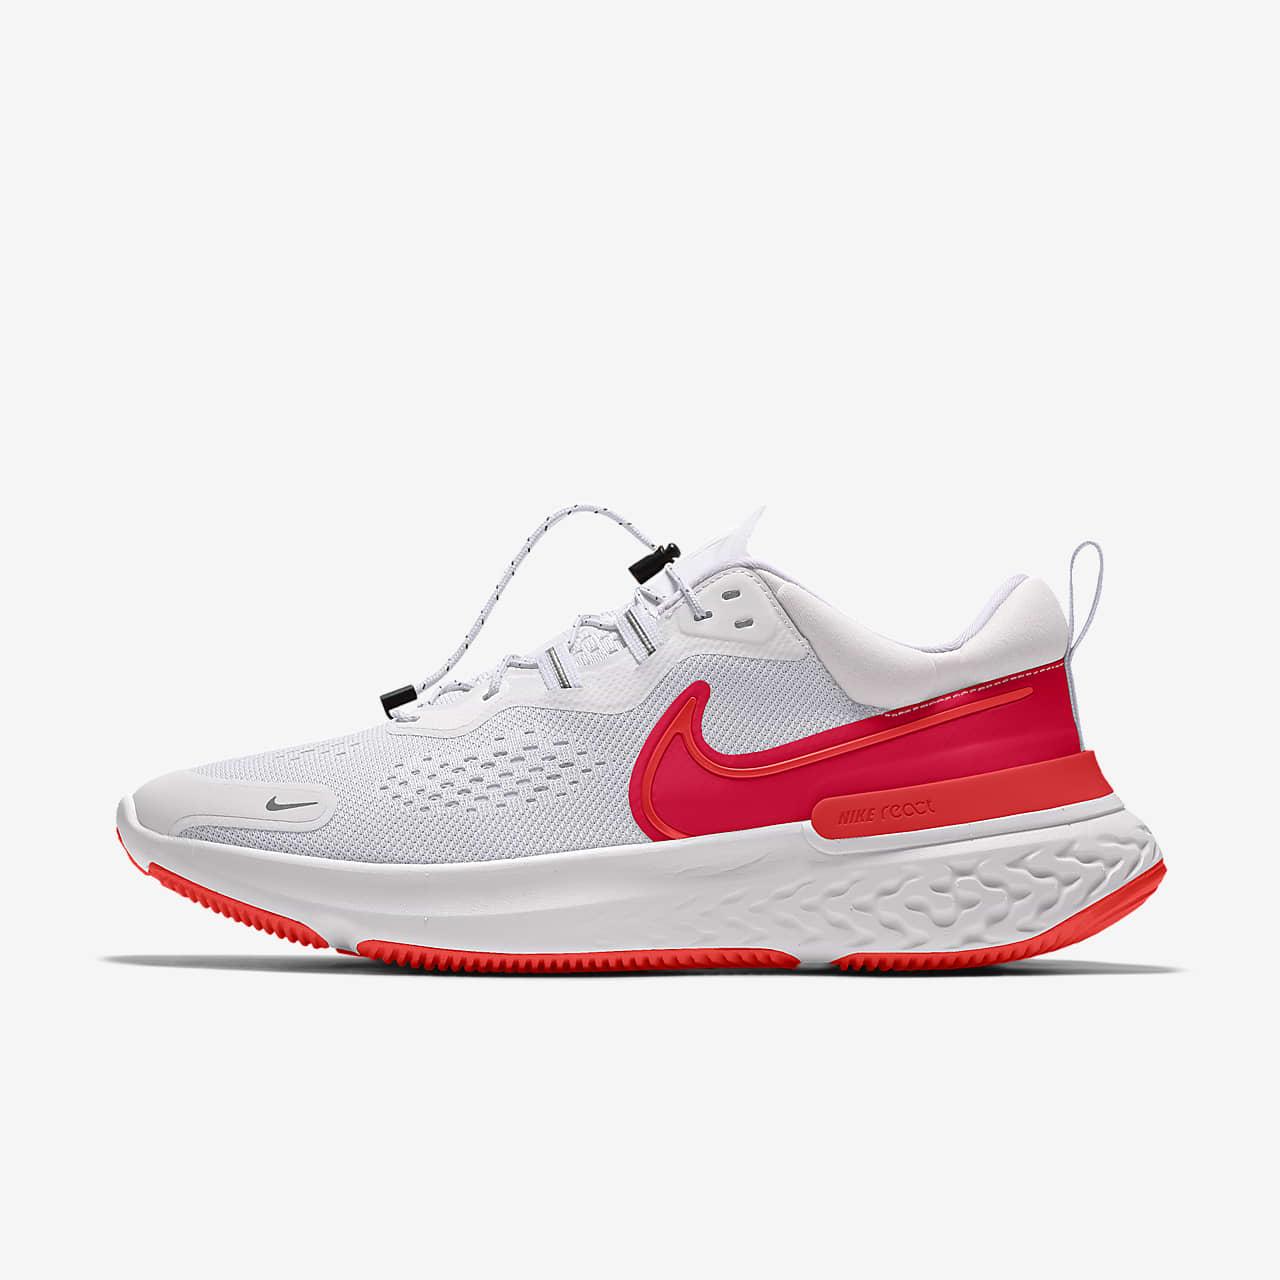 Nike React Miler 2 By You Zapatillas de running personalizables - Hombre